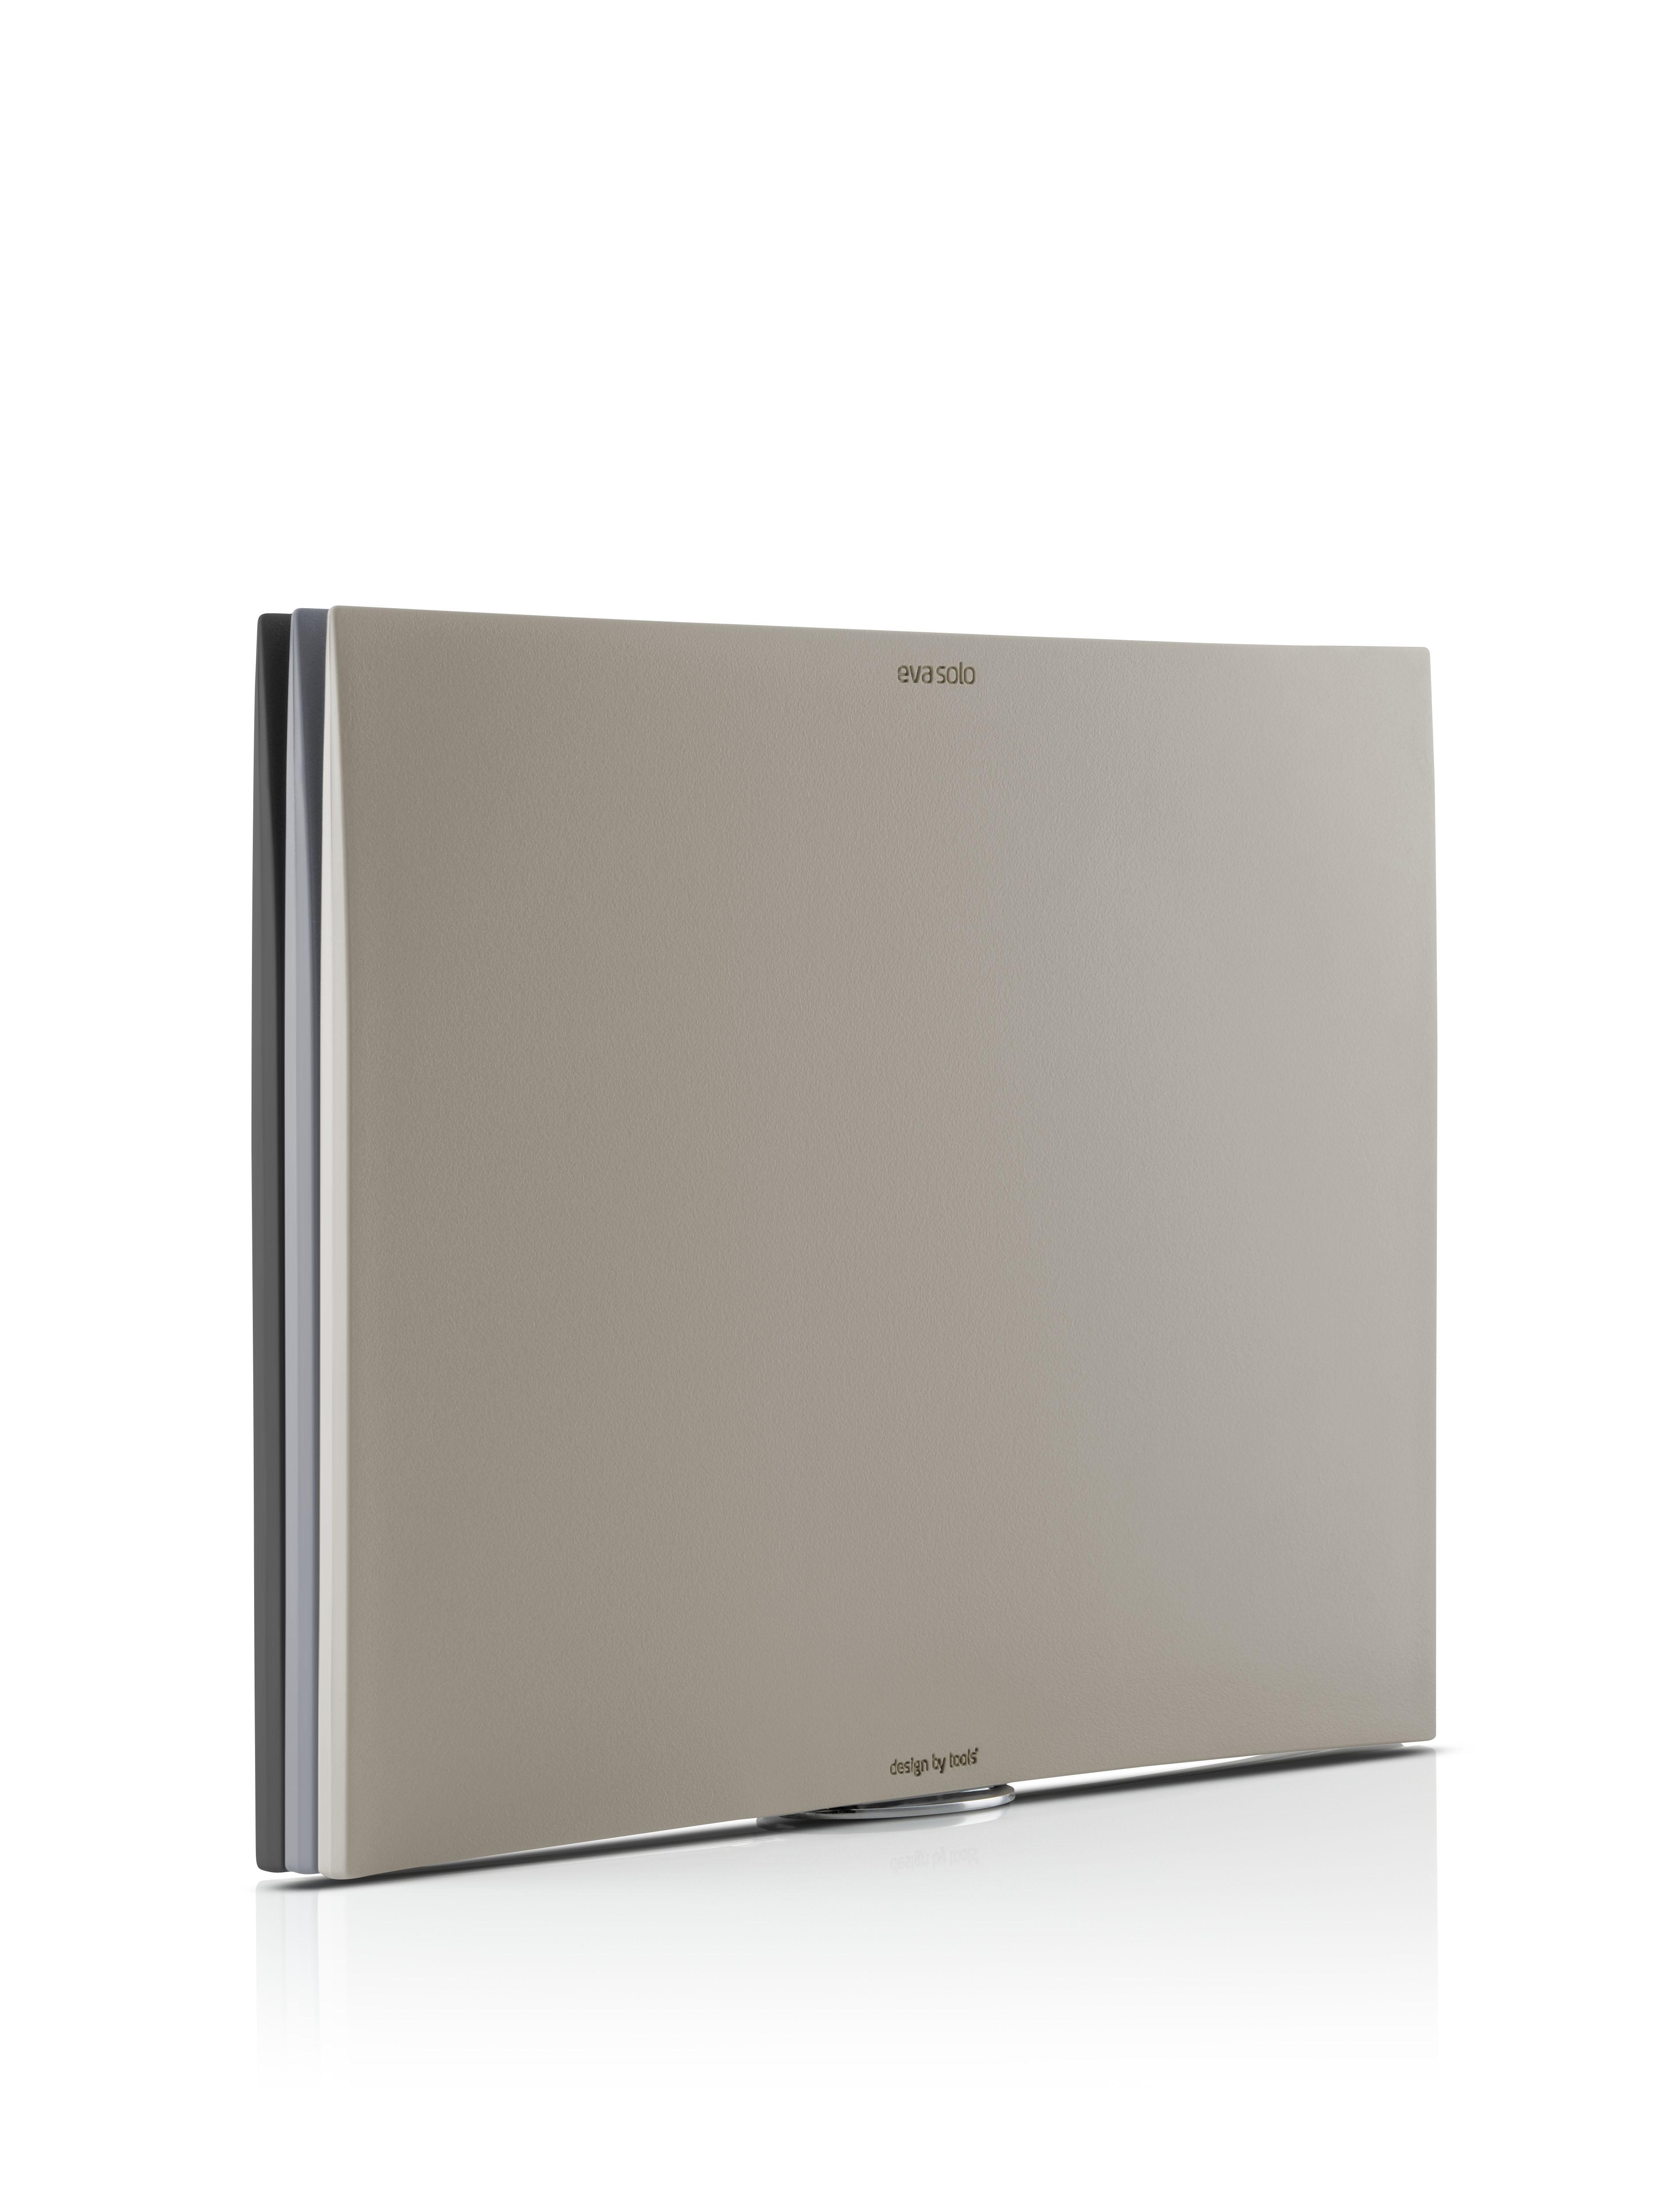 Eva Solo - Cutting Boards Set of 3 - Grey (520400)